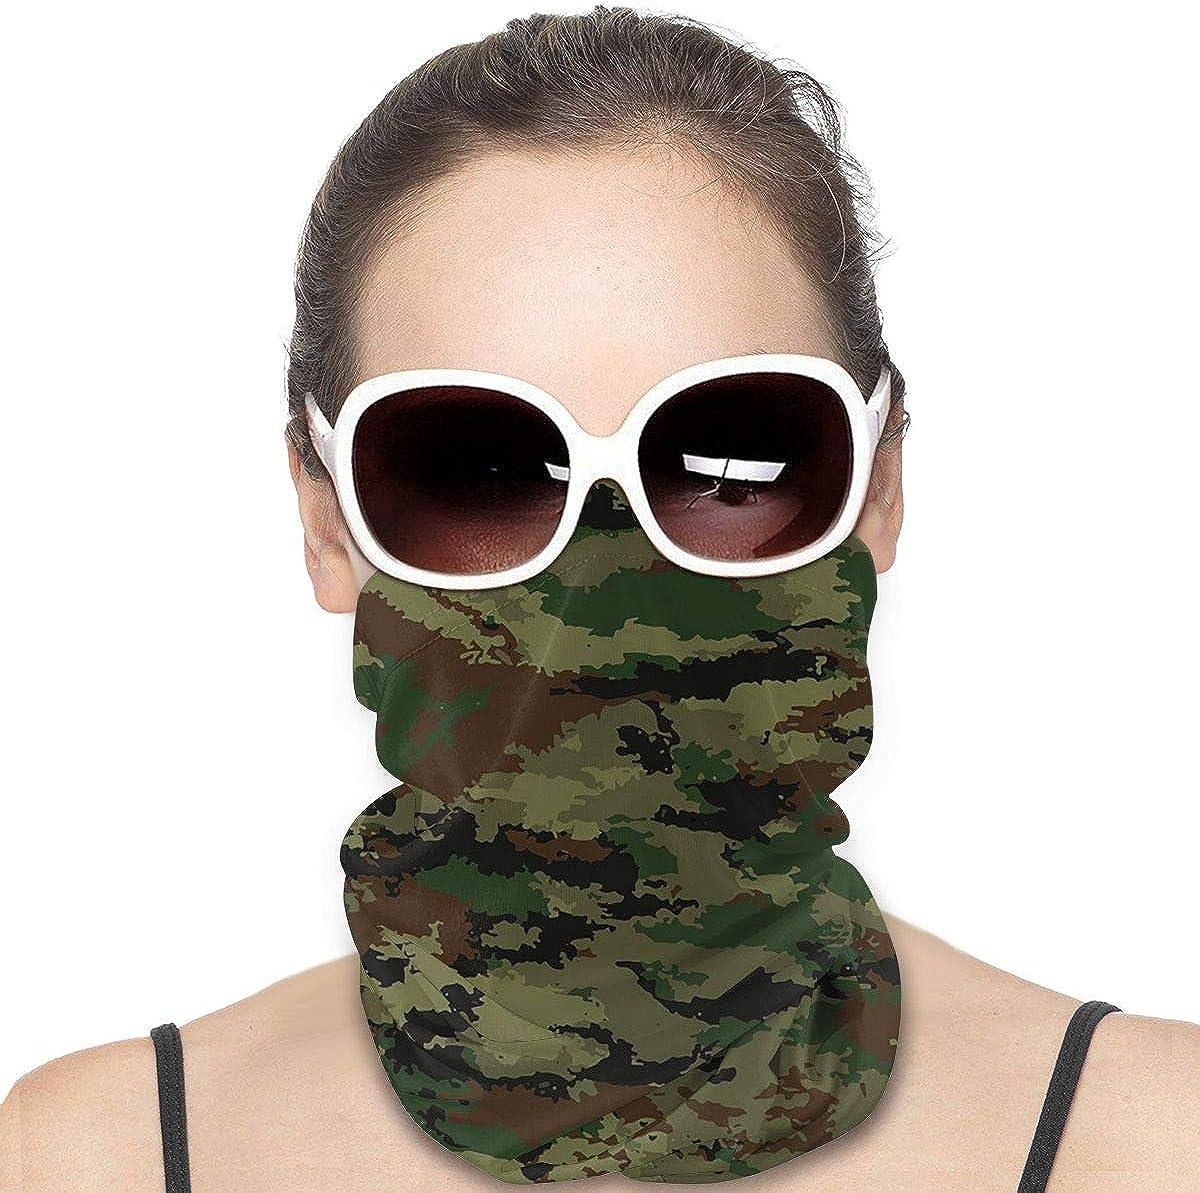 KiuLoam Women Bandanas Face Mask, Camouflage Military Background Neck Gaiter Mask Headband for Men Face Scarf Dust, Outdoors, Sports